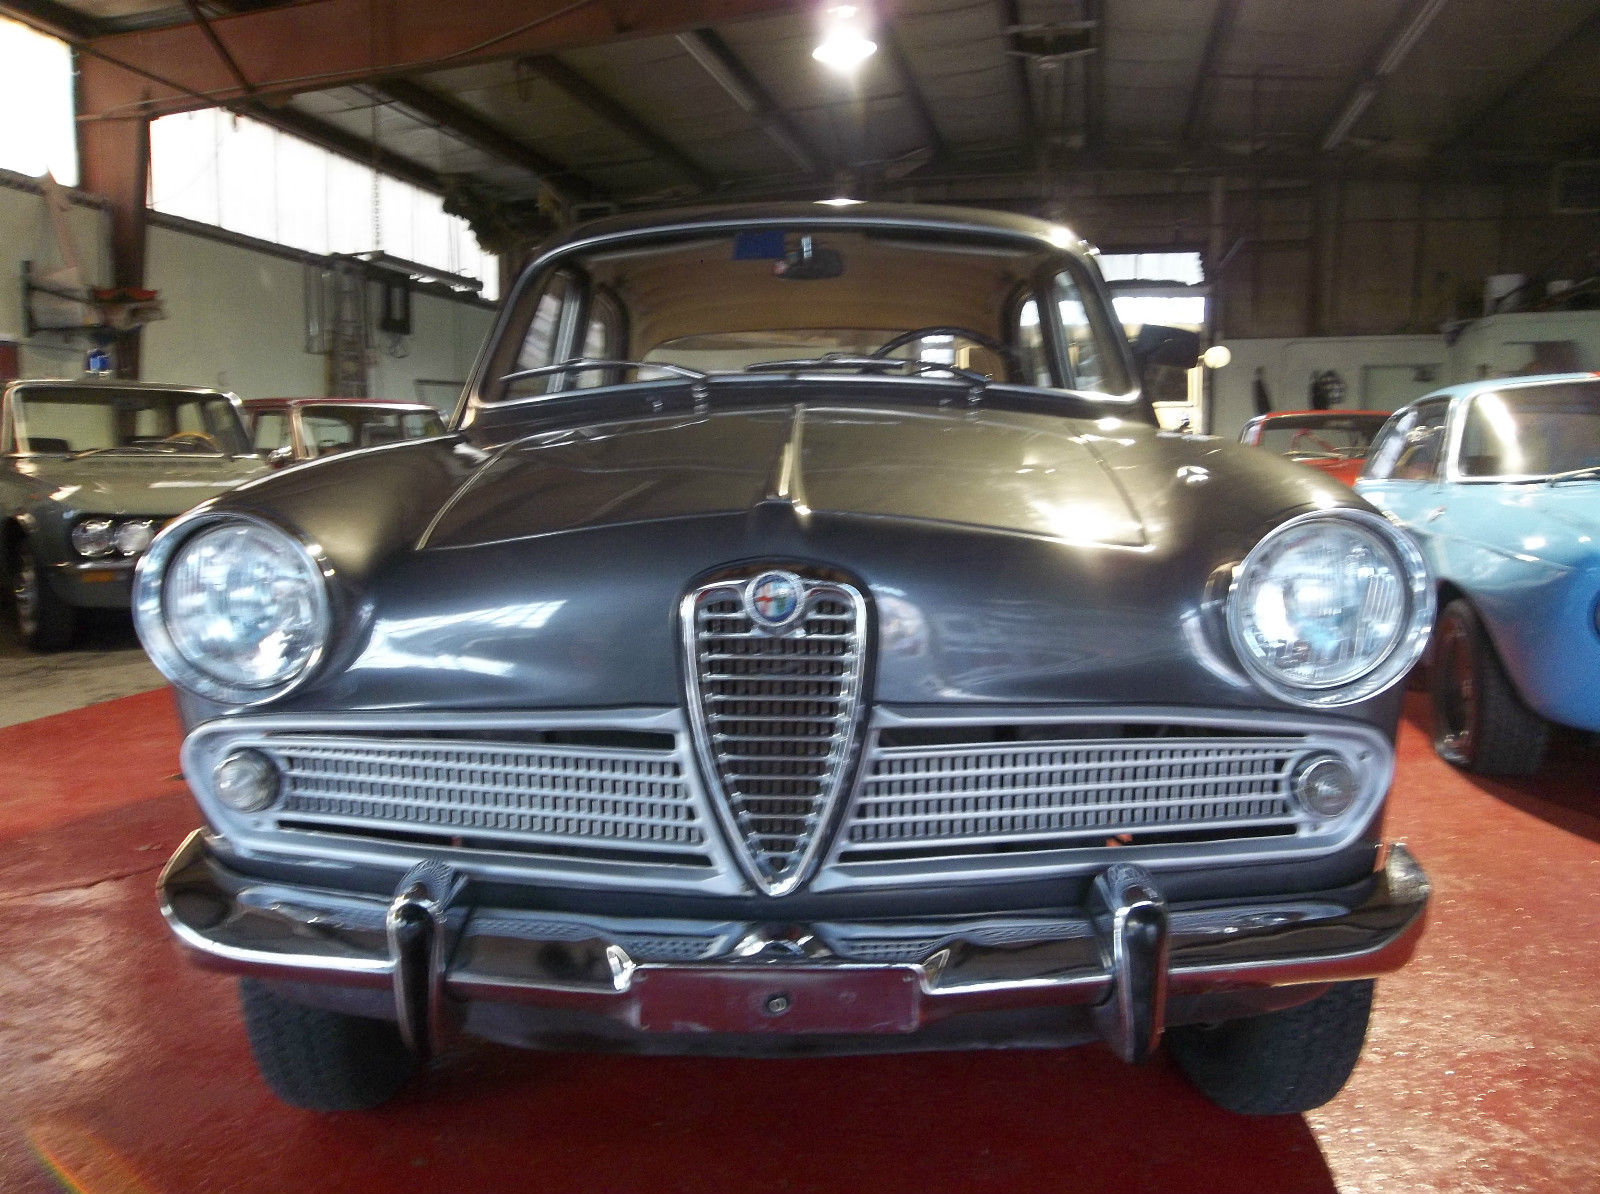 ALFA ROMEO Giulietta TI Classic Alfa Romeo Other For Sale - 1960 alfa romeo giulietta for sale